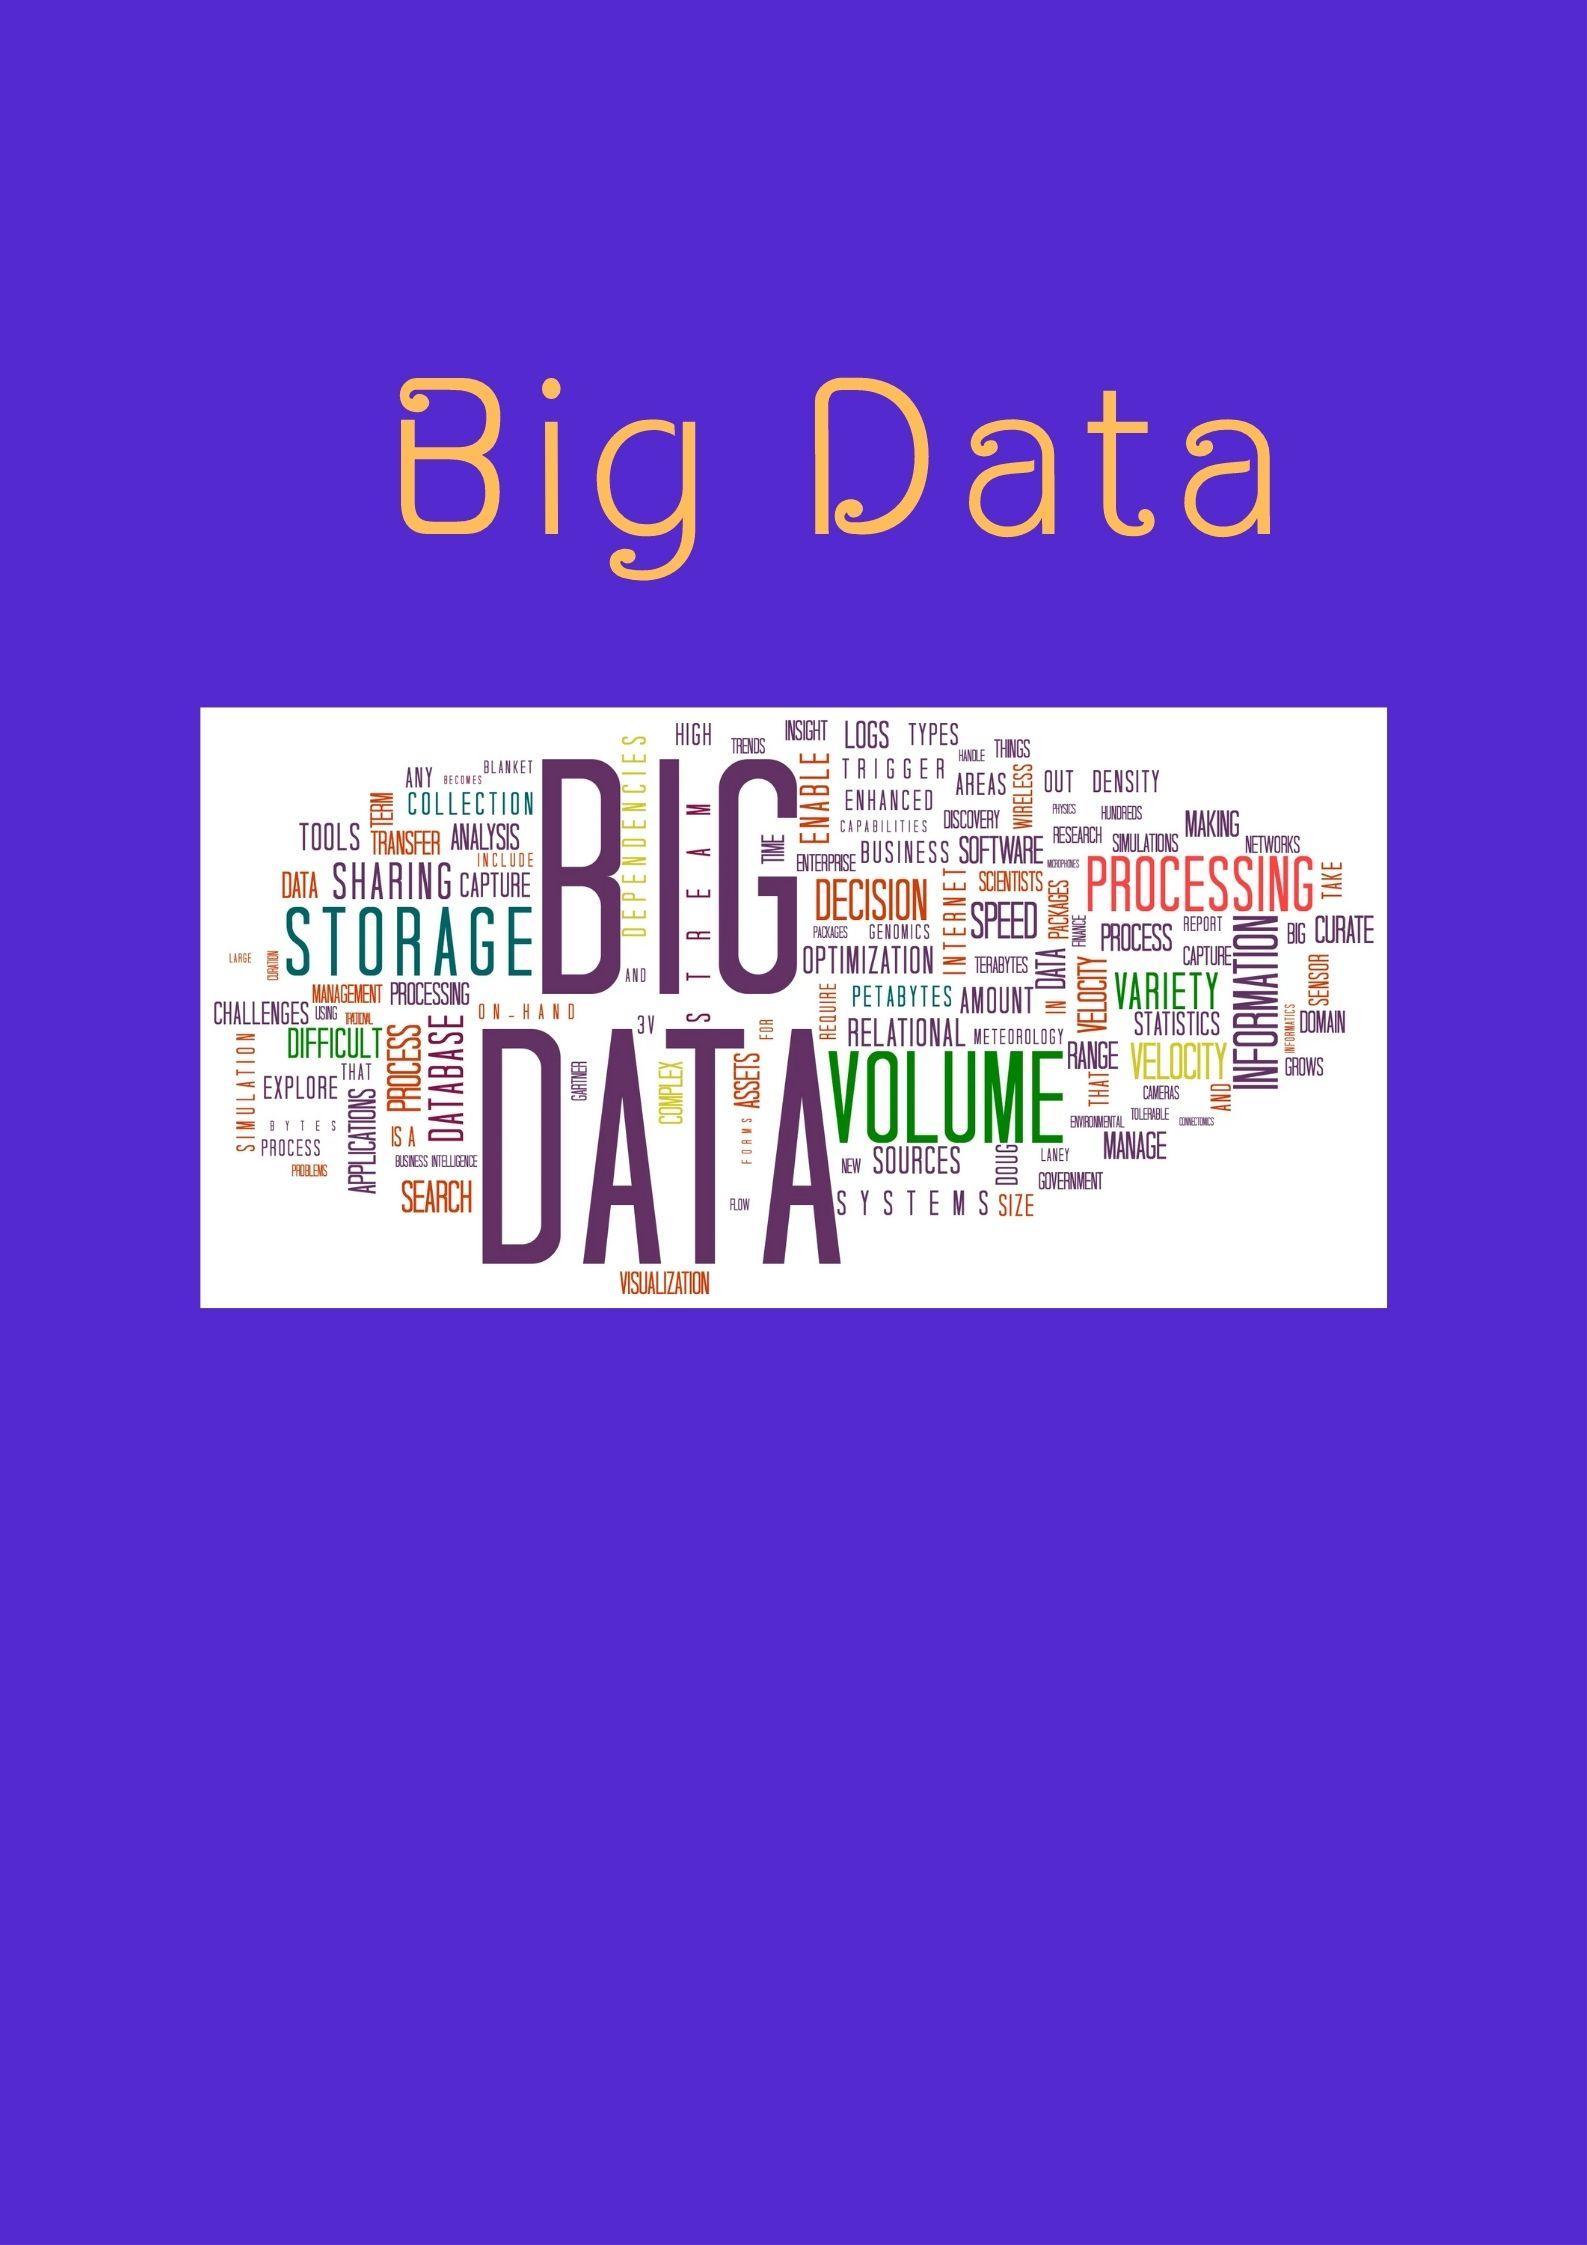 Big-Data-คืออะไร-ทำไมต้อง-Big-Data